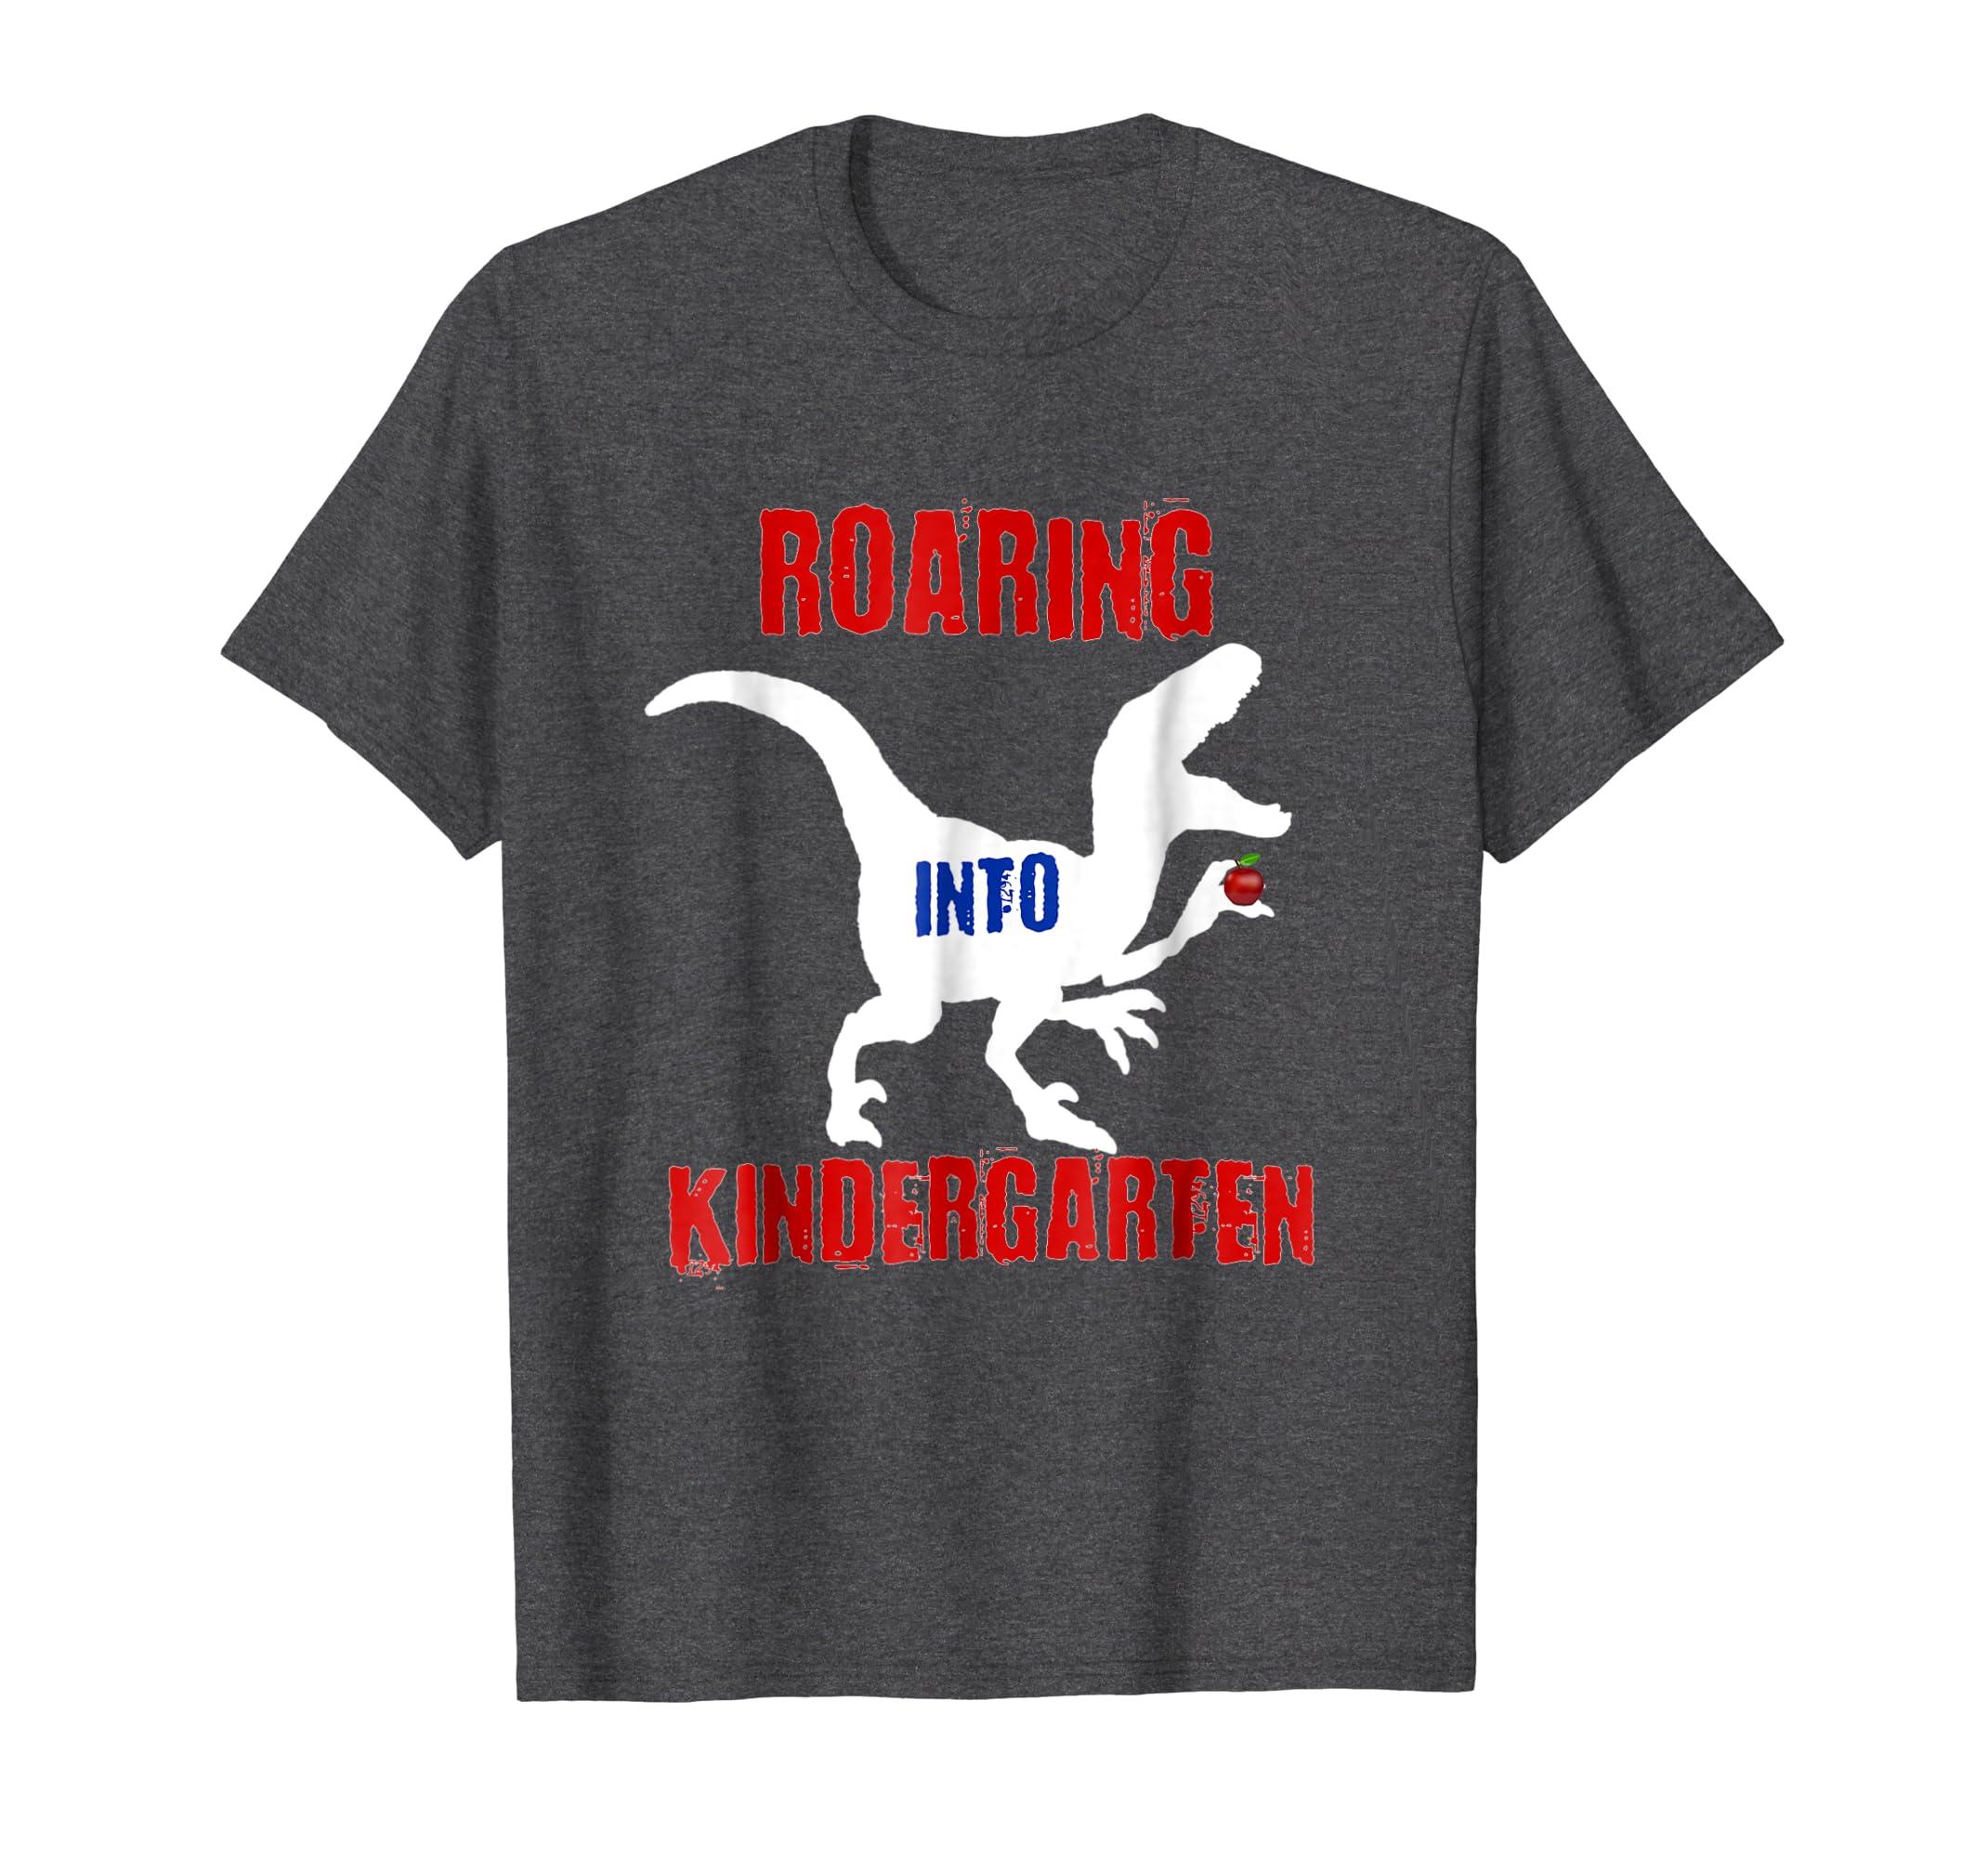 Back to School Shirt Boys Dinosaur Roaring Into Kindergarten-Awarplus